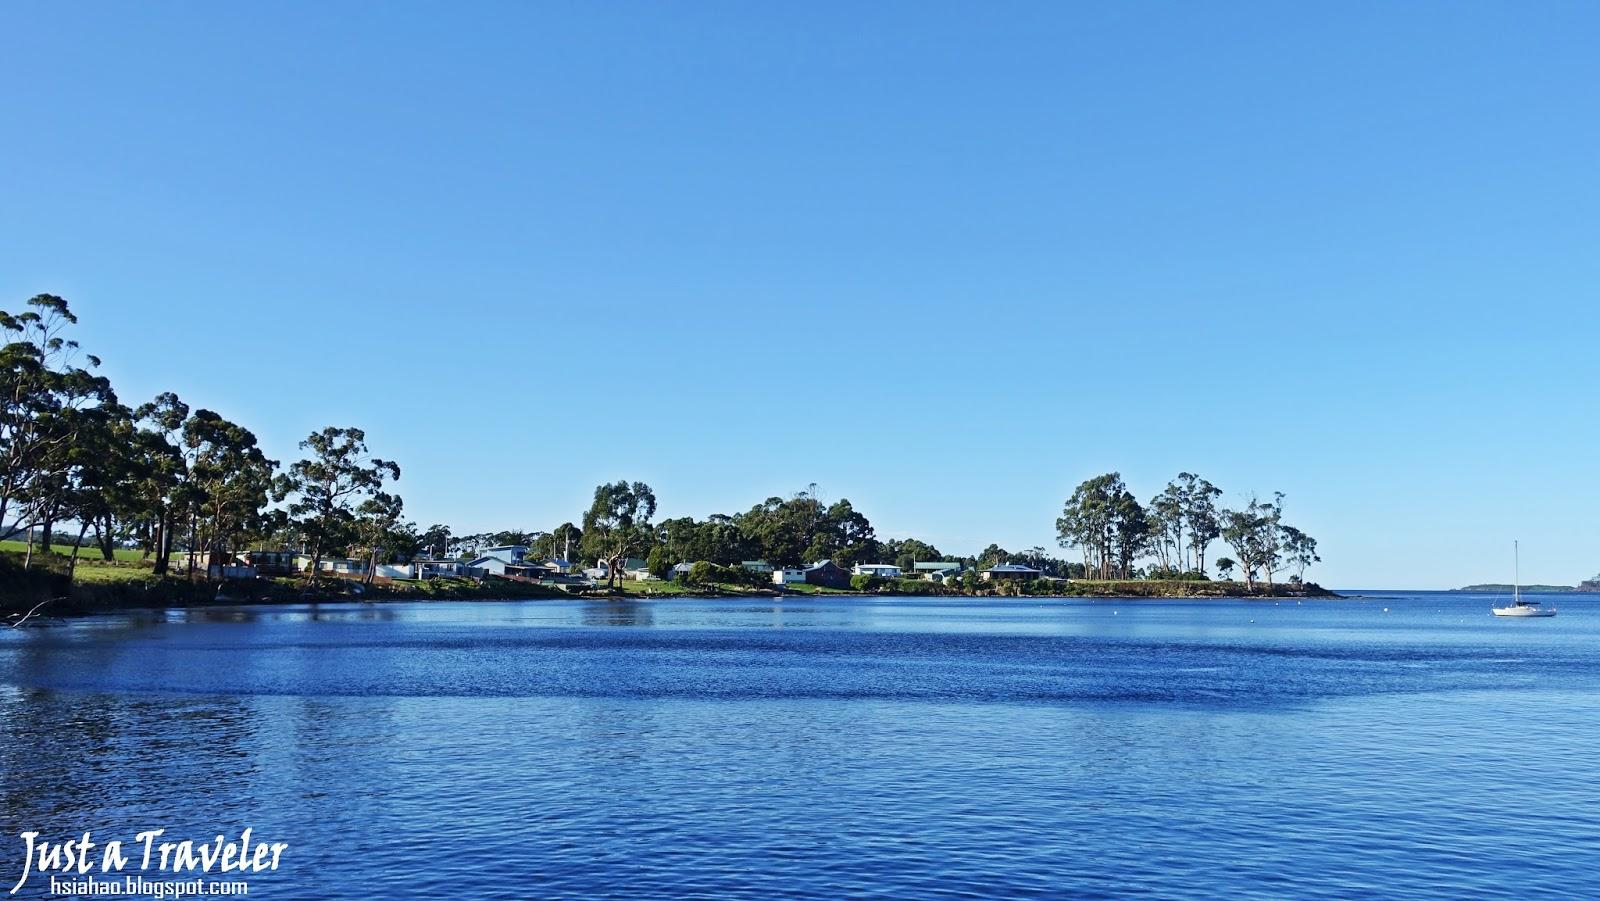 塔斯馬尼亞-Tasmania-景點-美食-交通-遊記-澳洲-自由行-旅遊-travel-attraction